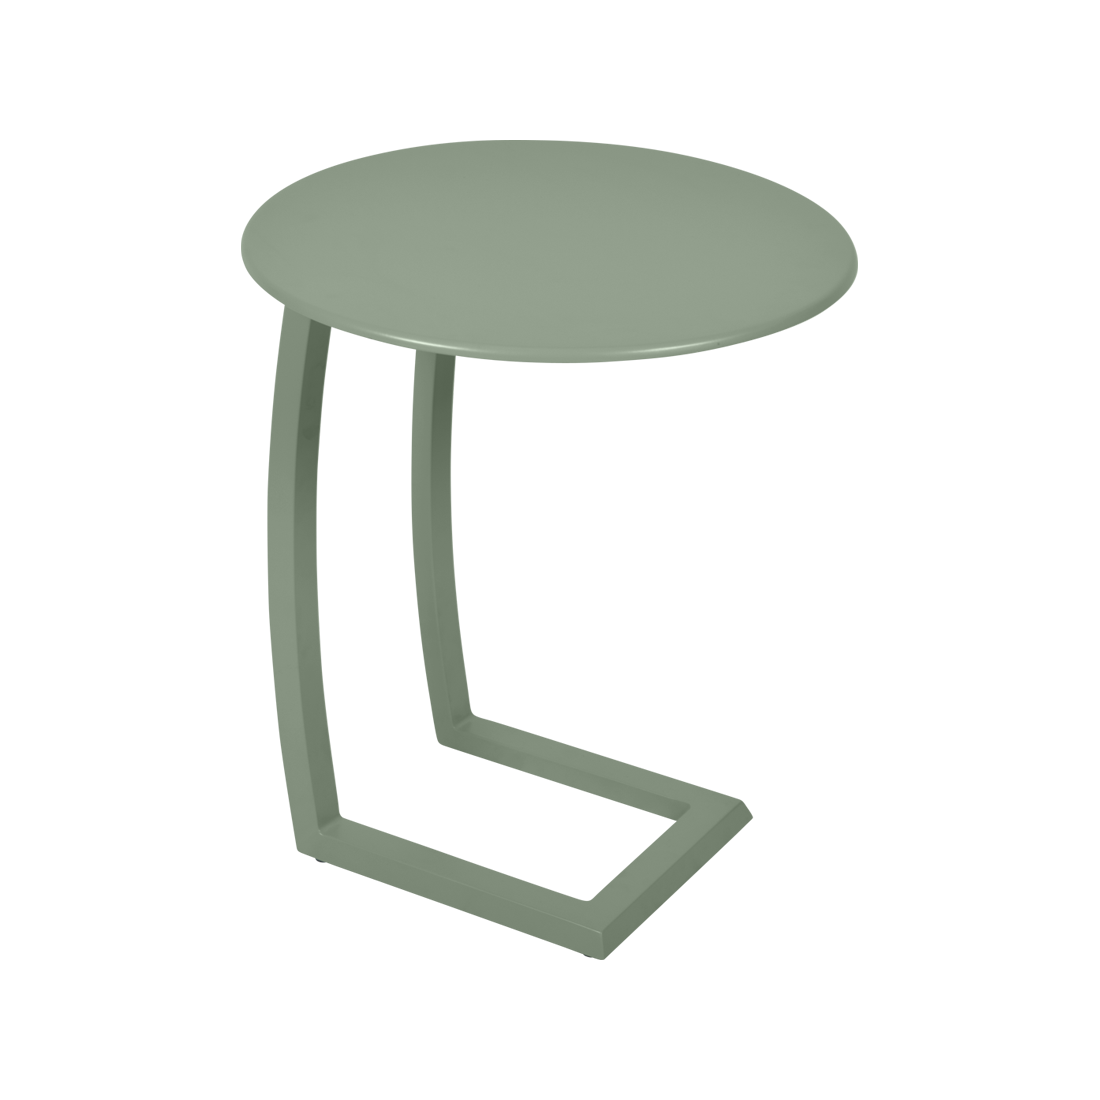 Table Basse Deportee Alize Petite Table Basse Jardin En Metal